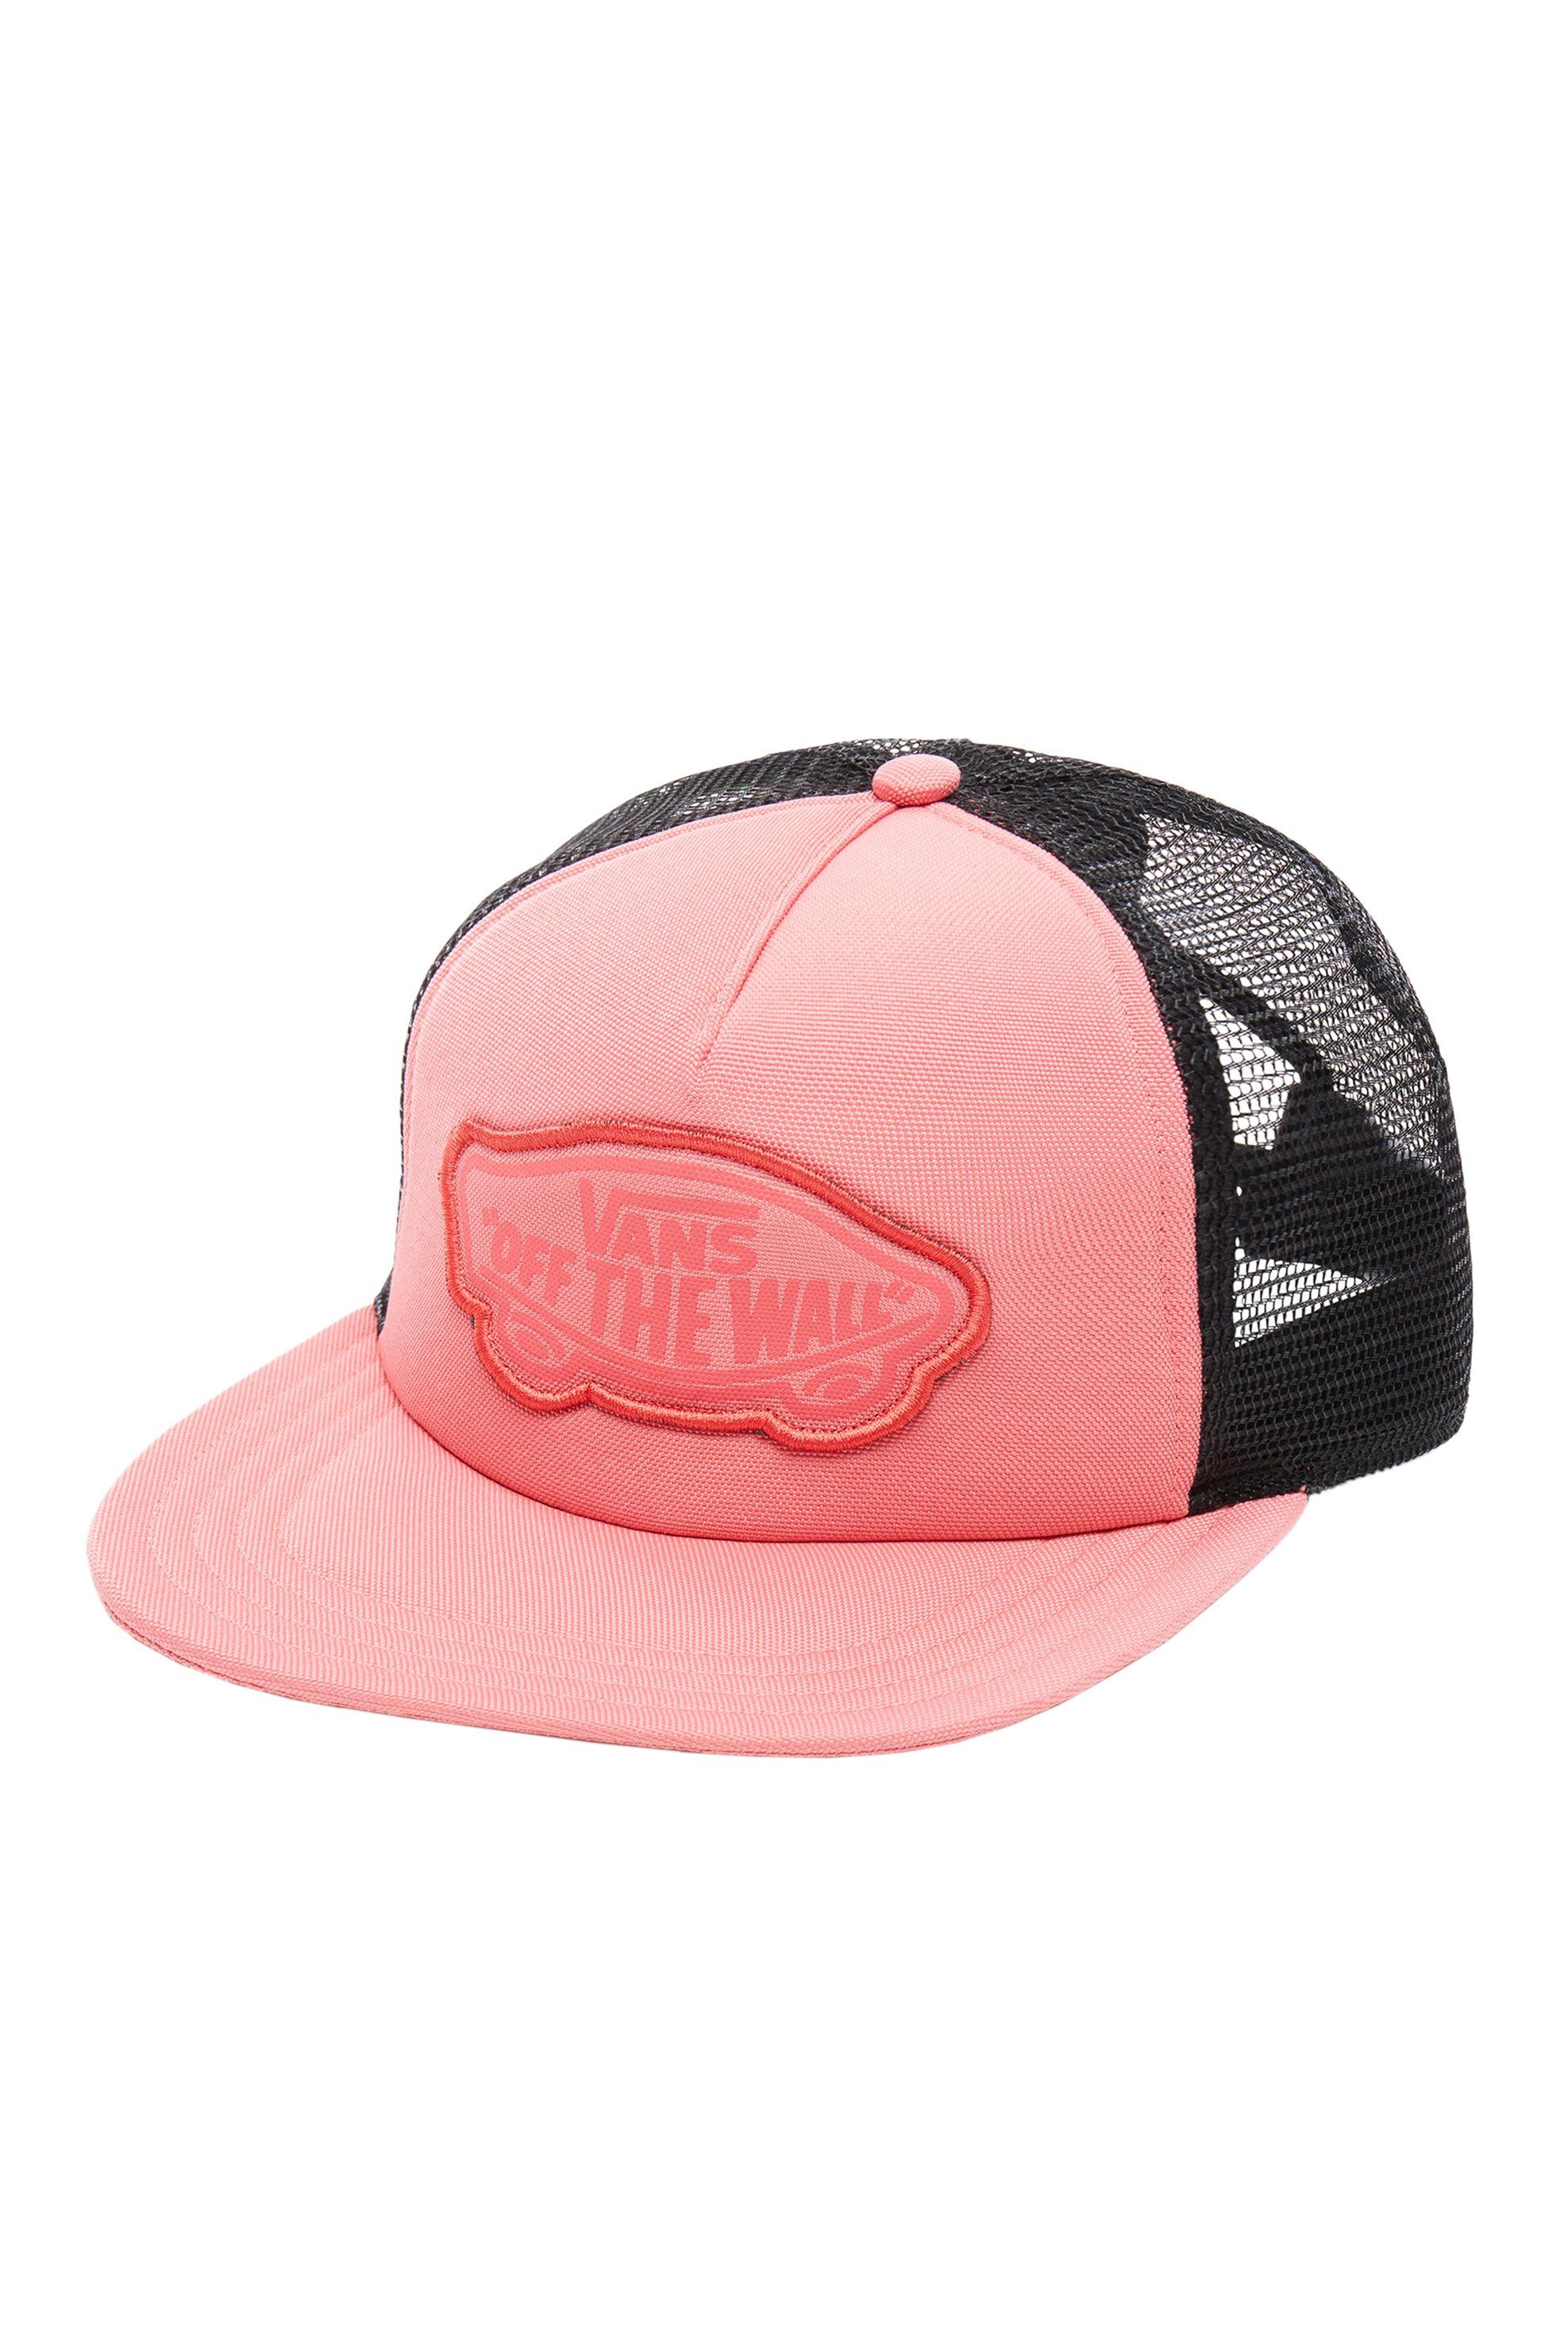 Vans γυναικείο καπέλο Beach Girl Trucker - VN000H5LYDZ1 - Κοραλί γυναικα   αξεσουαρ   καπέλα  σκούφοι   αξεσουάρ